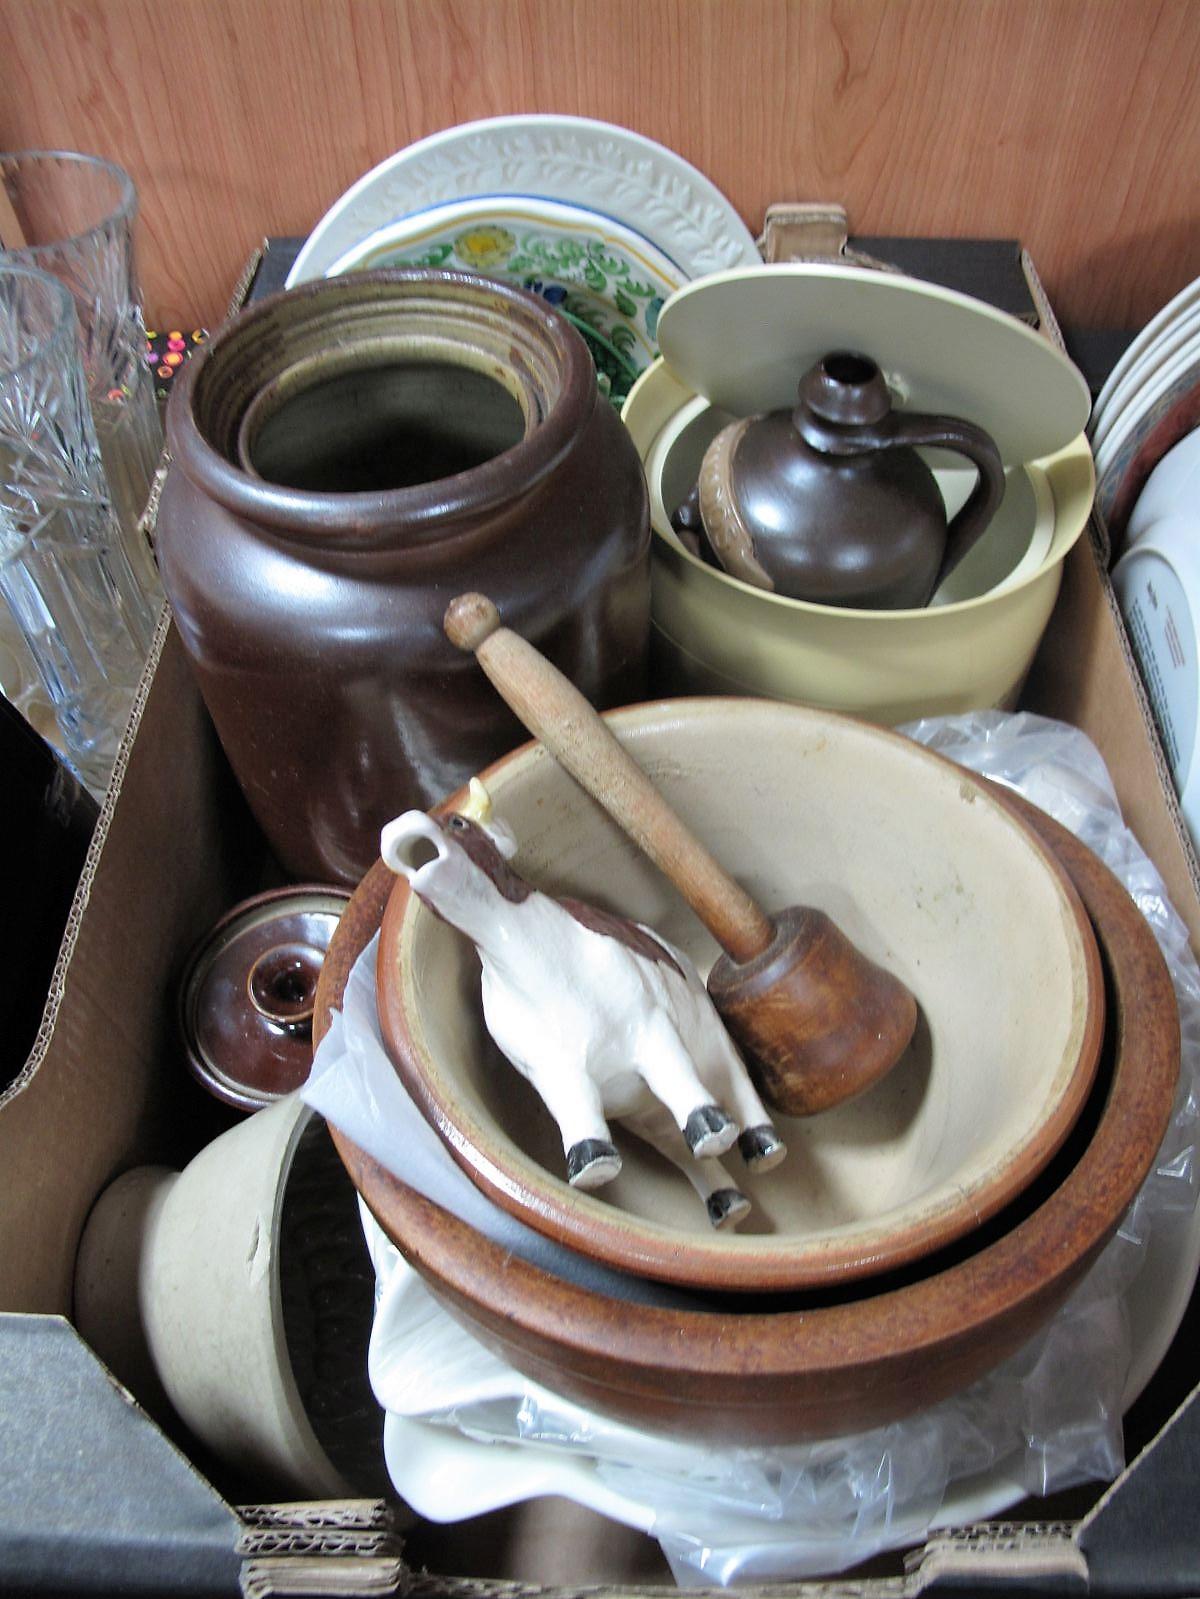 Lot 758 - A Salt Glaze Jar, sycamore bowl, punch, stoneware jelly mould, kitchenalia:- One Box